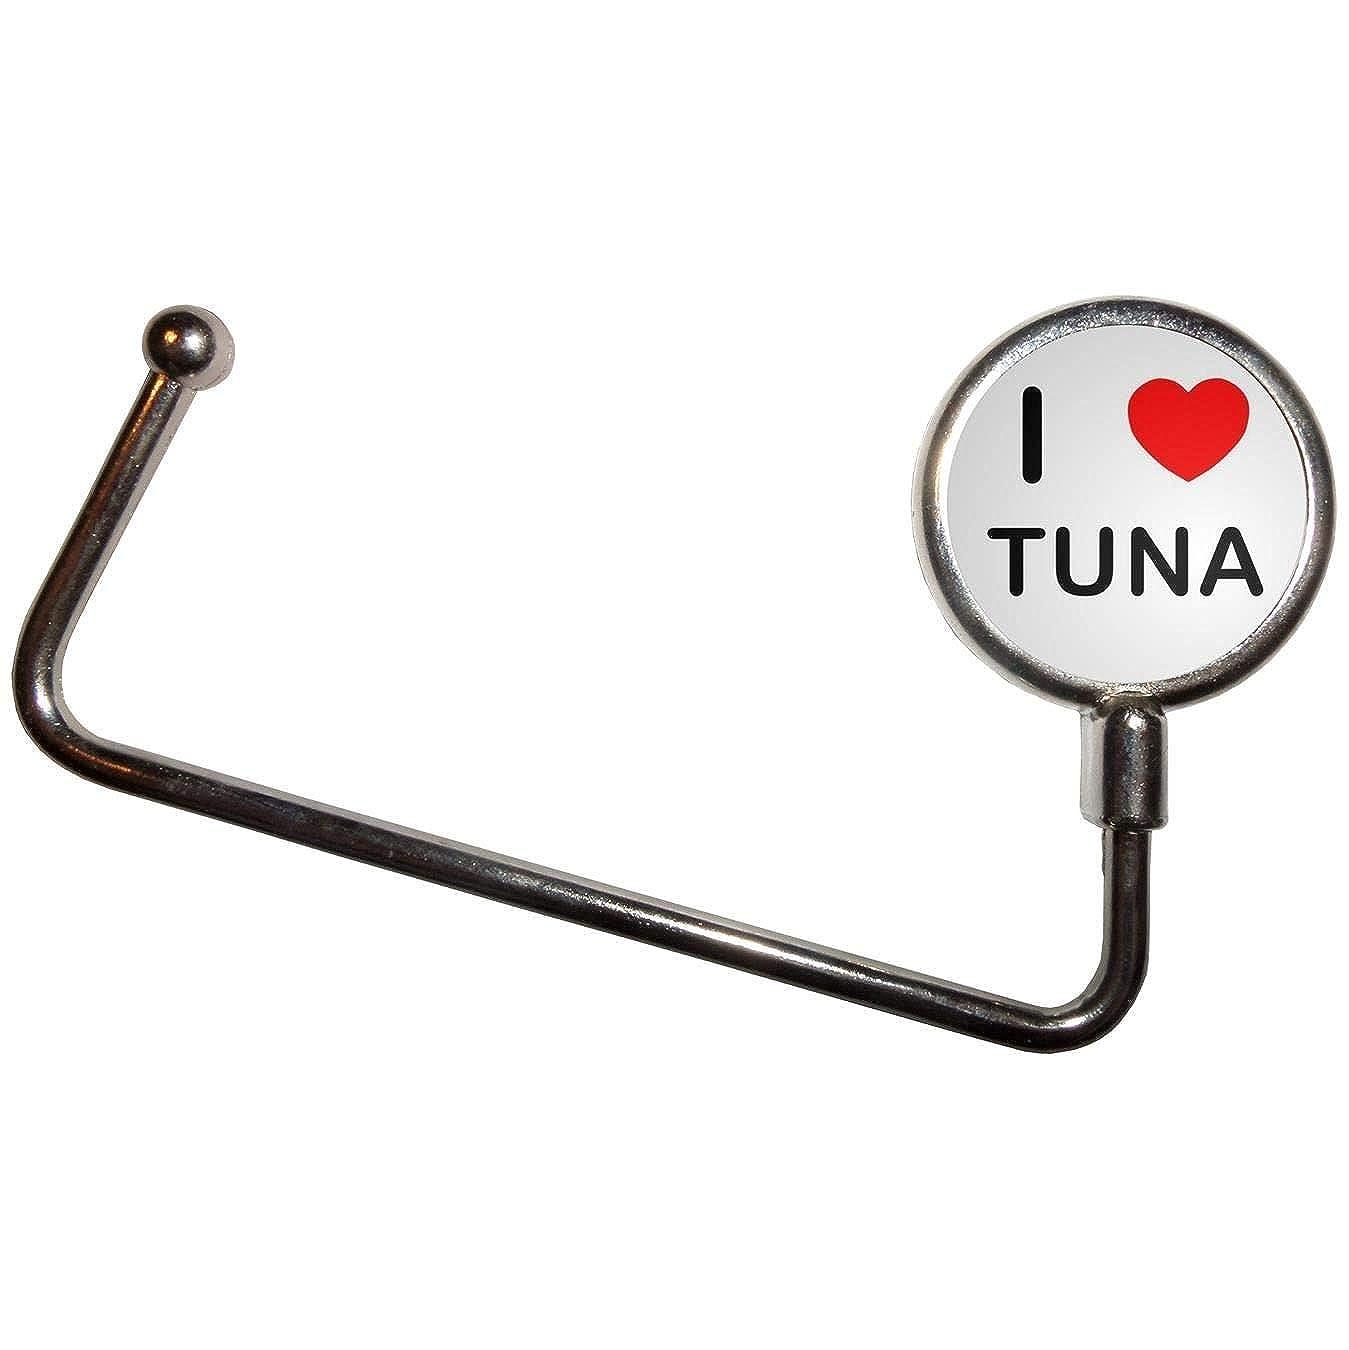 I Love Tuna Handbag Table Hook Hanger